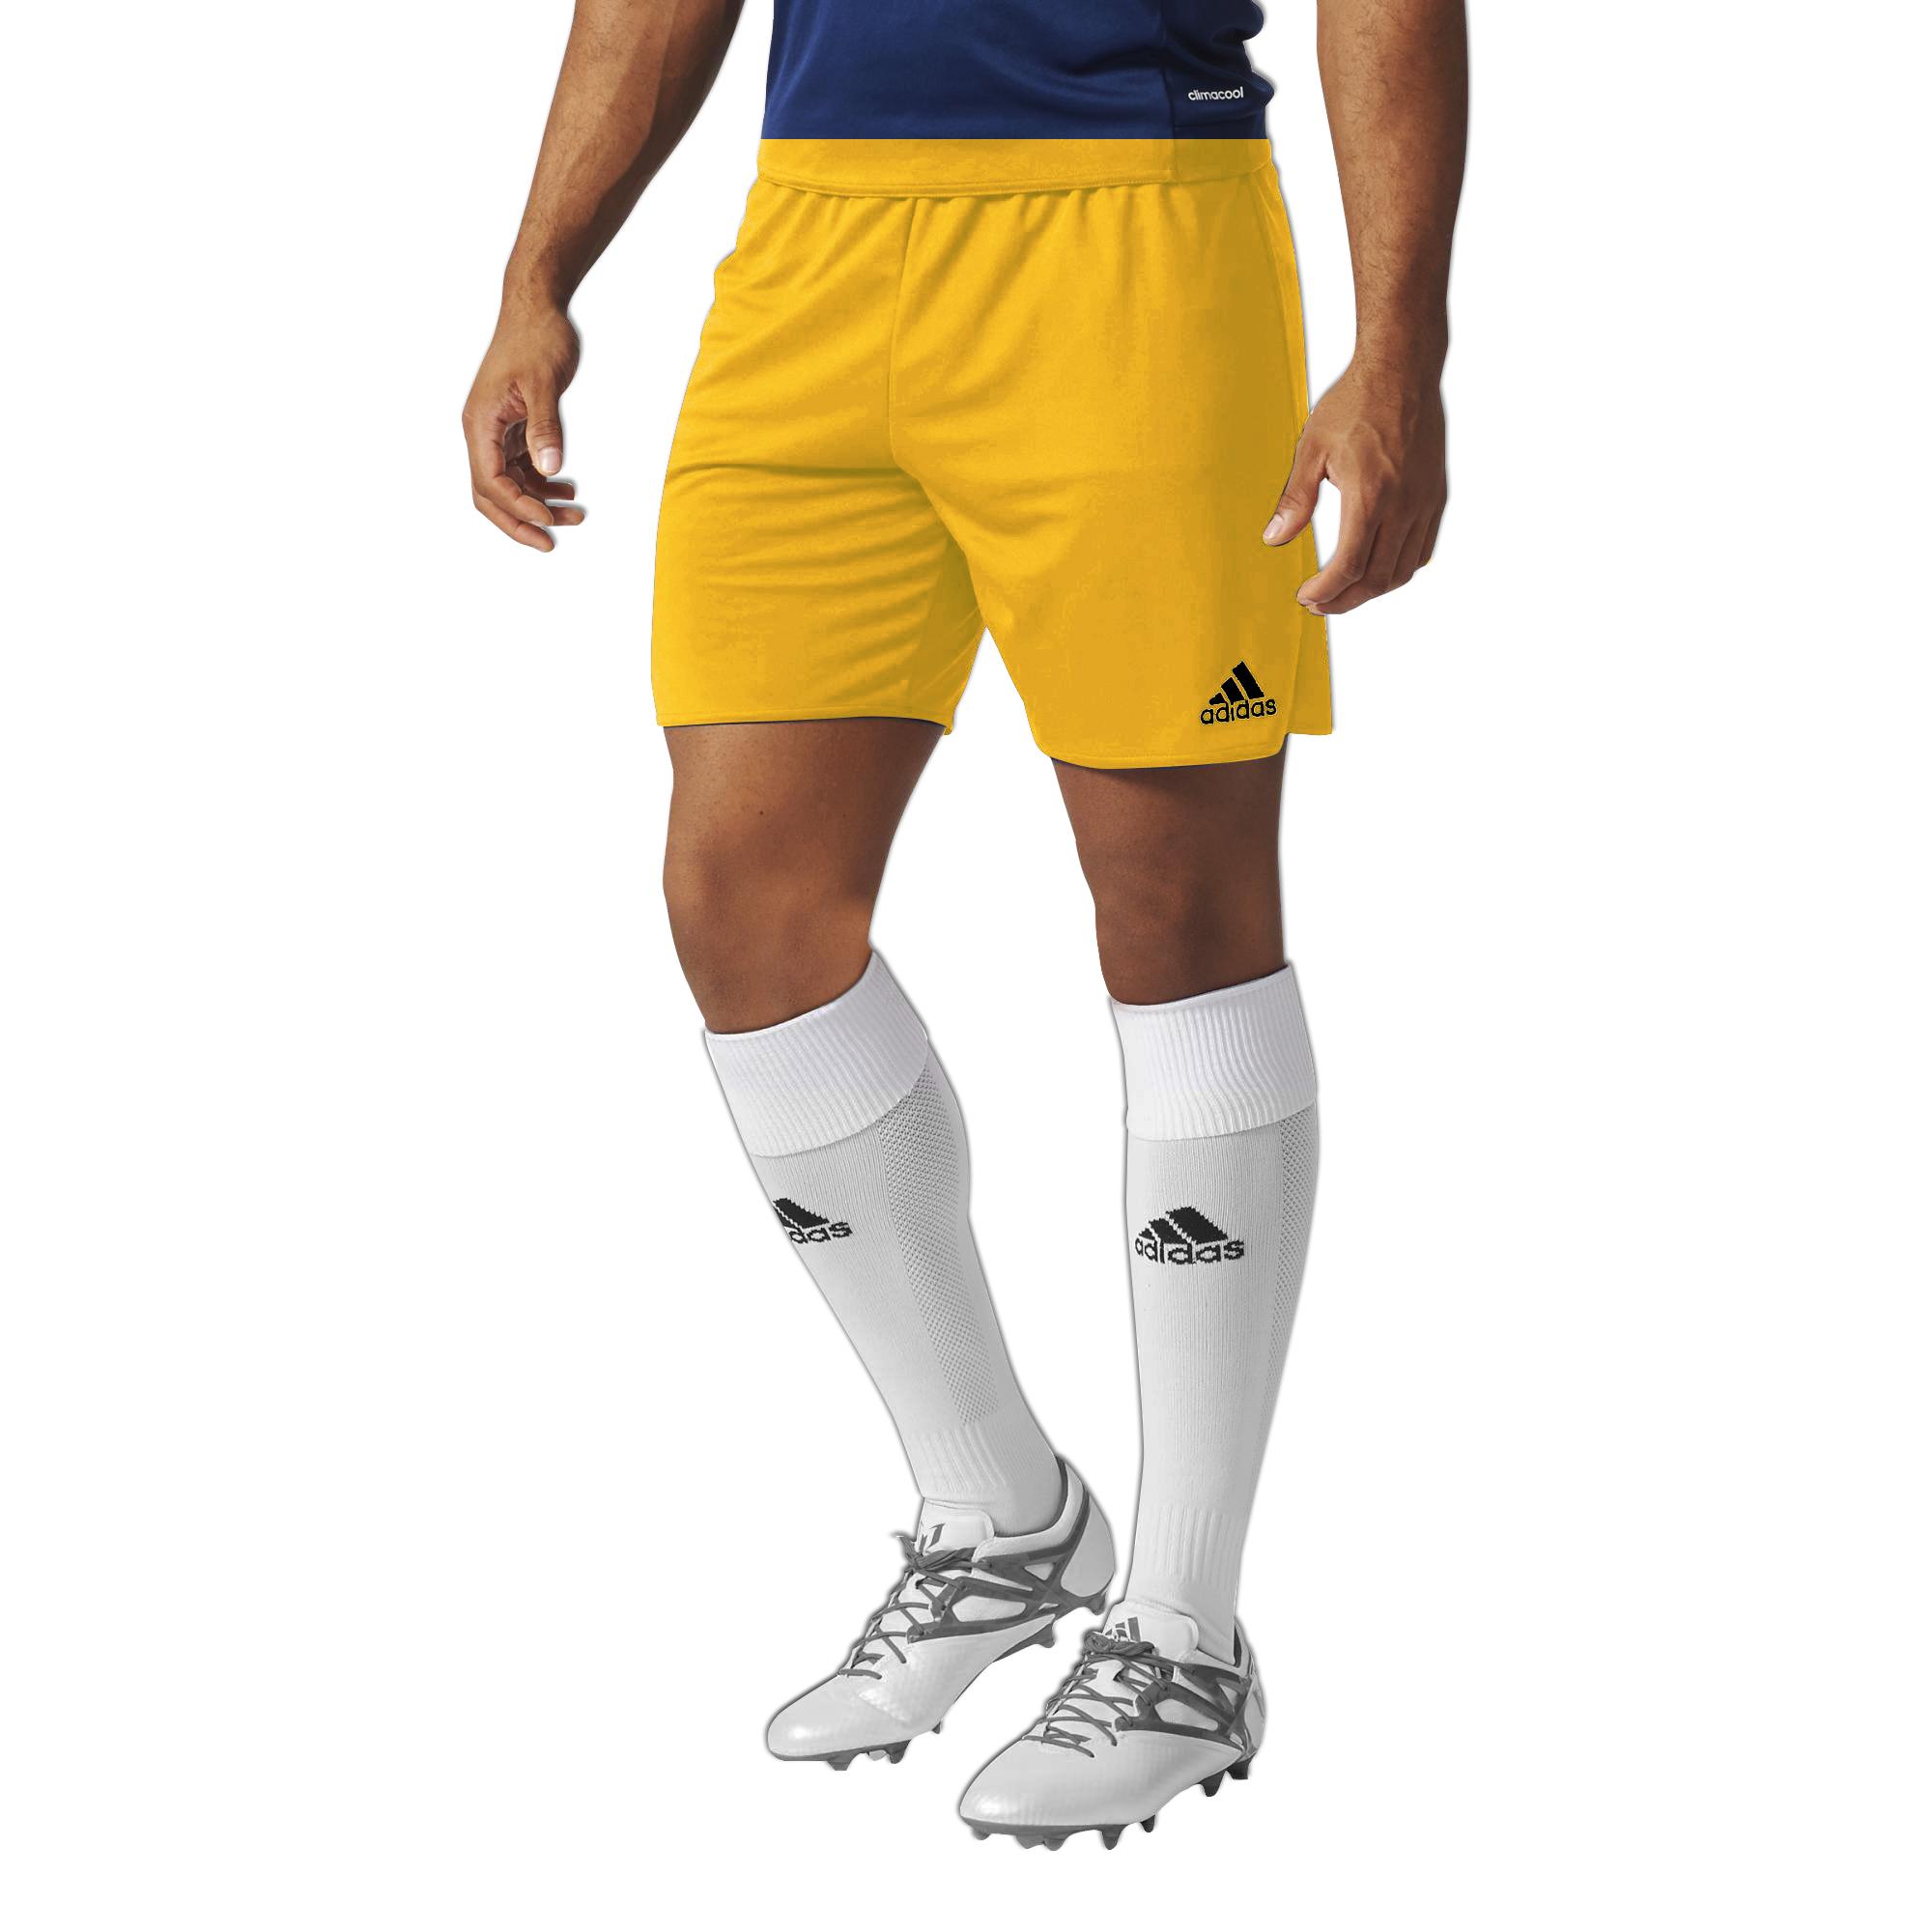 adidas-Men-039-s-Parma-Football-Training-Team-Wear-Shorts-Sport-Casual-Gym-B-Grade thumbnail 8